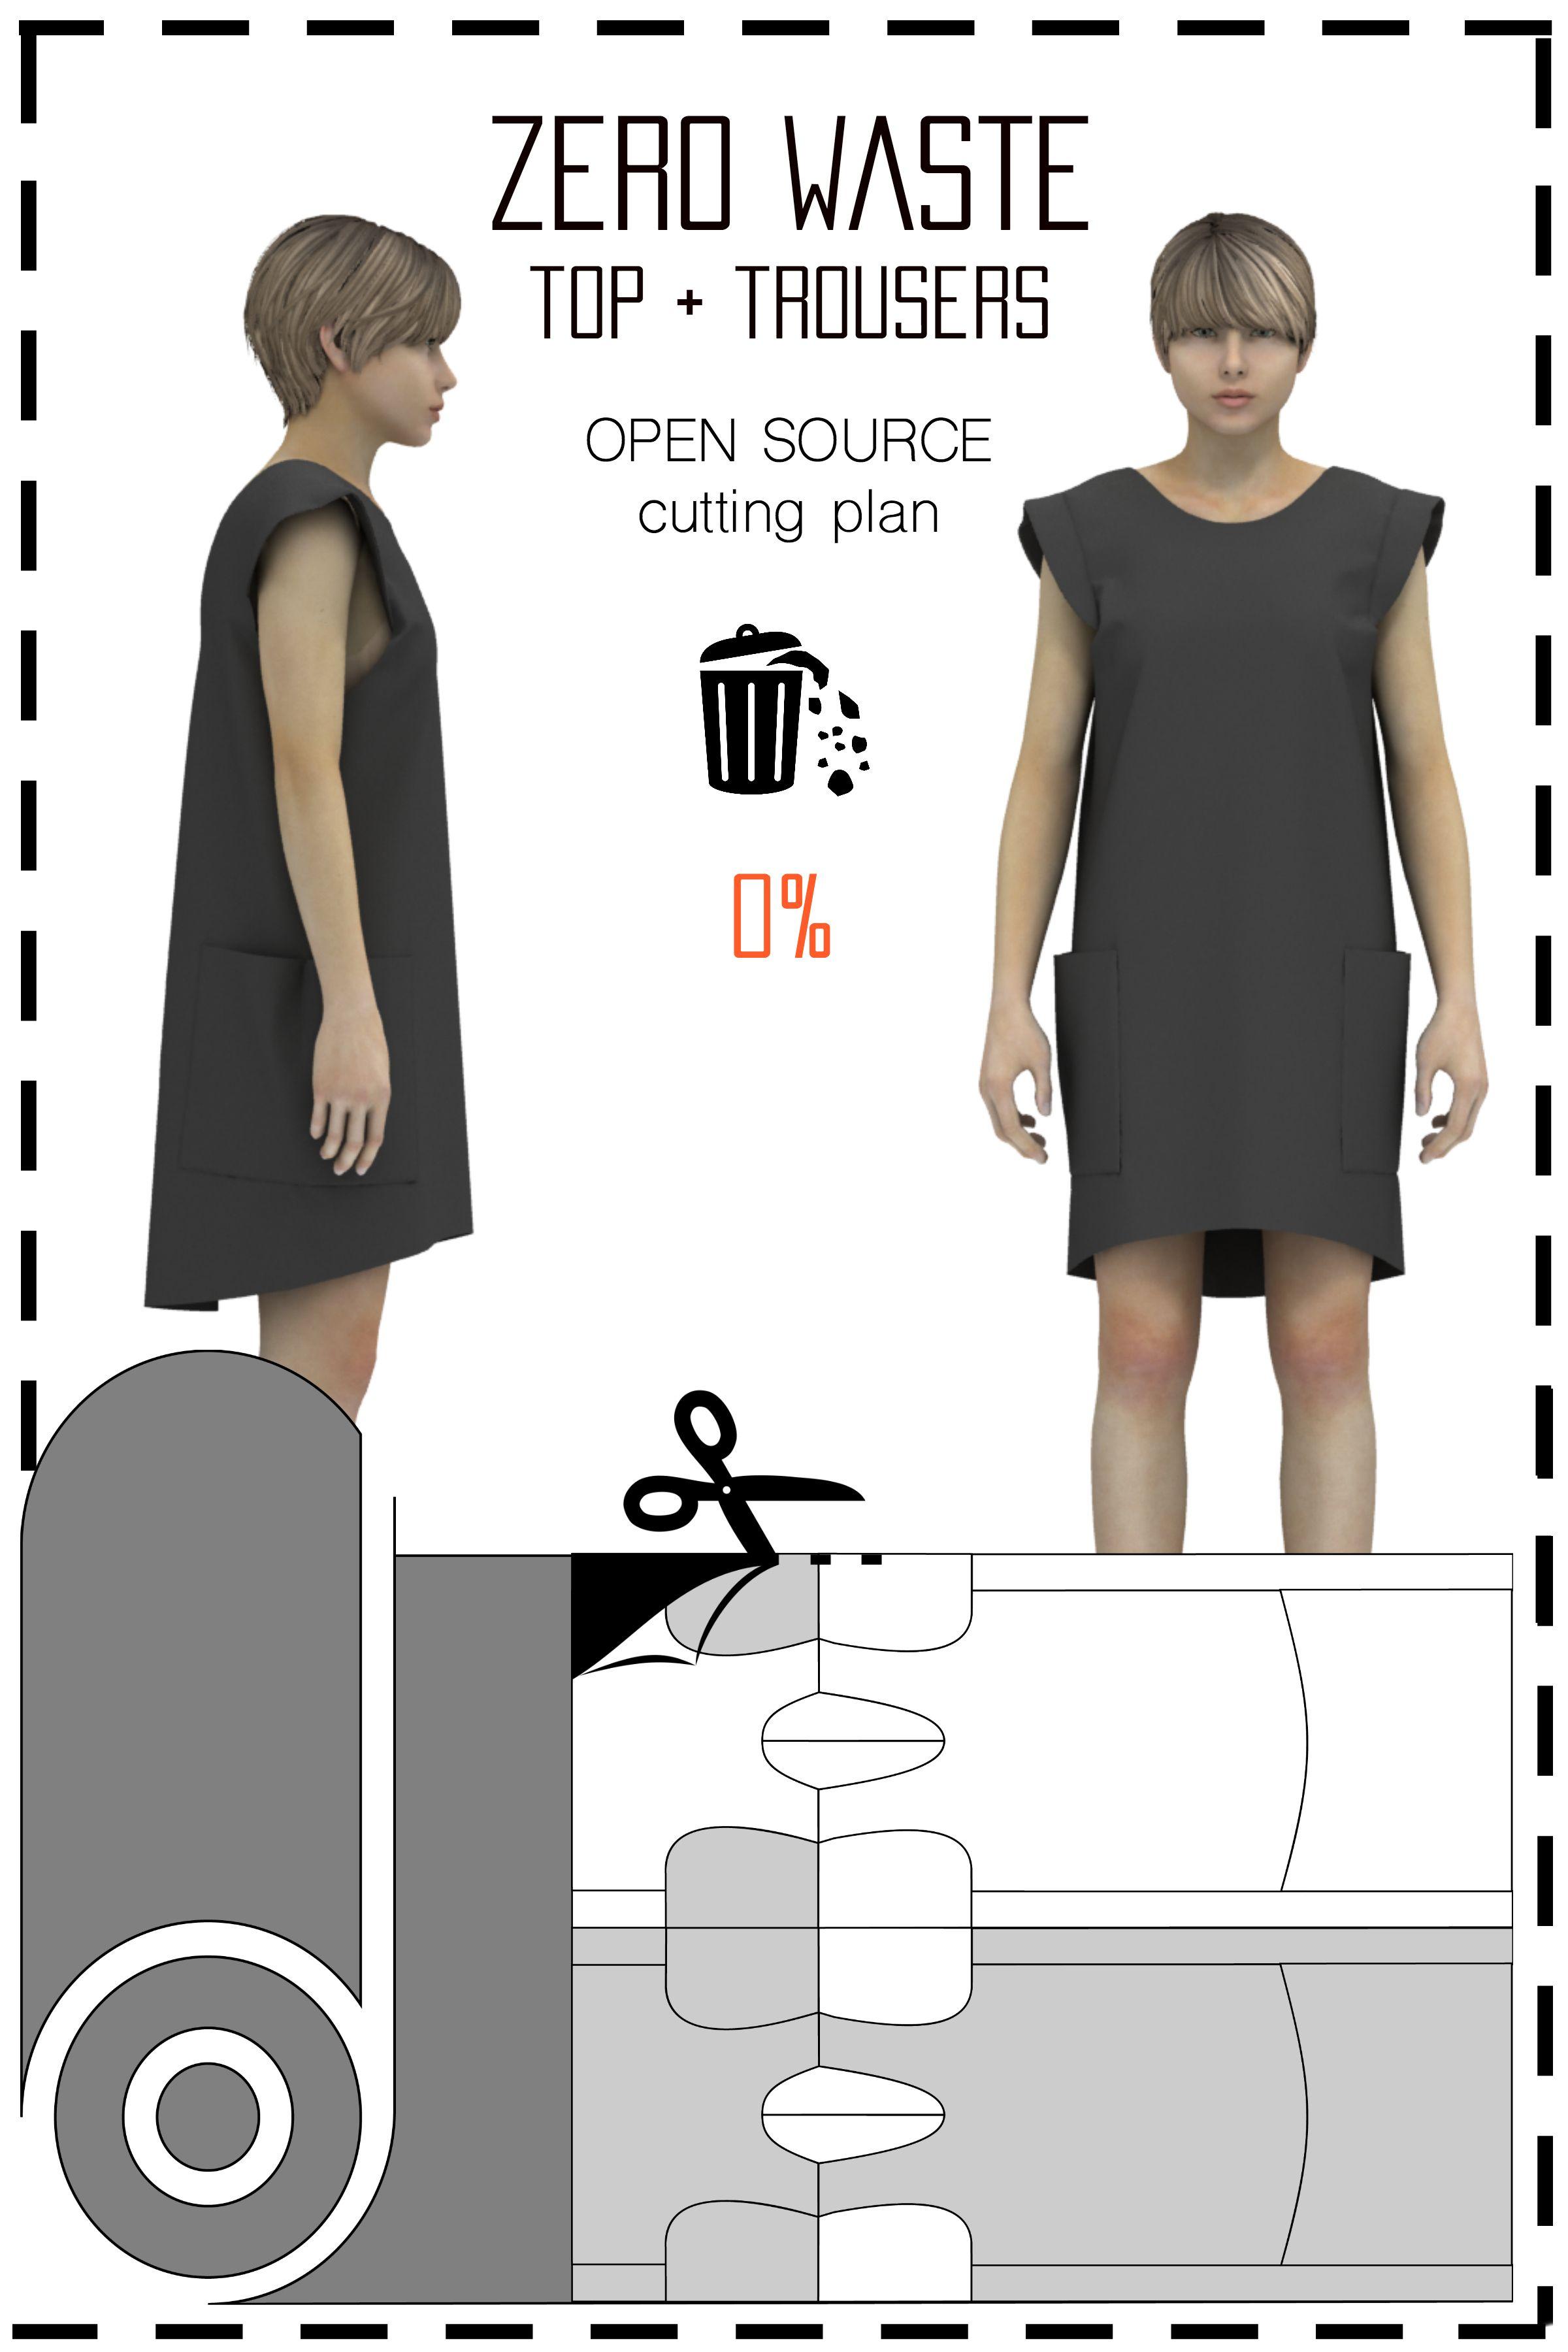 Pin by Aakansha Chugh on Zero waste | Patrones, Patronaje, Costura